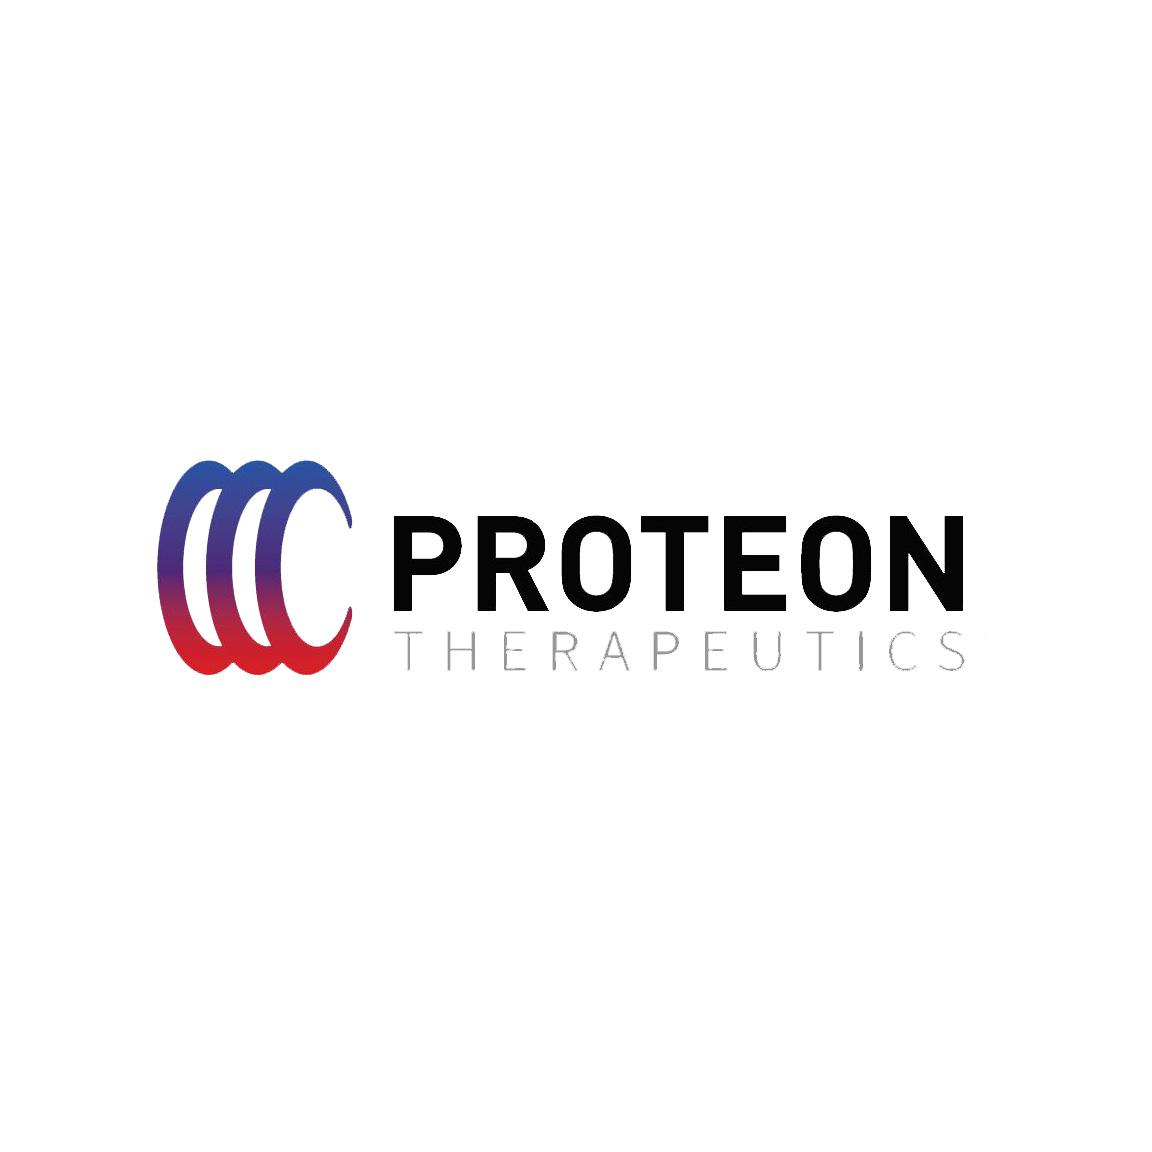 Proteon2.JPG